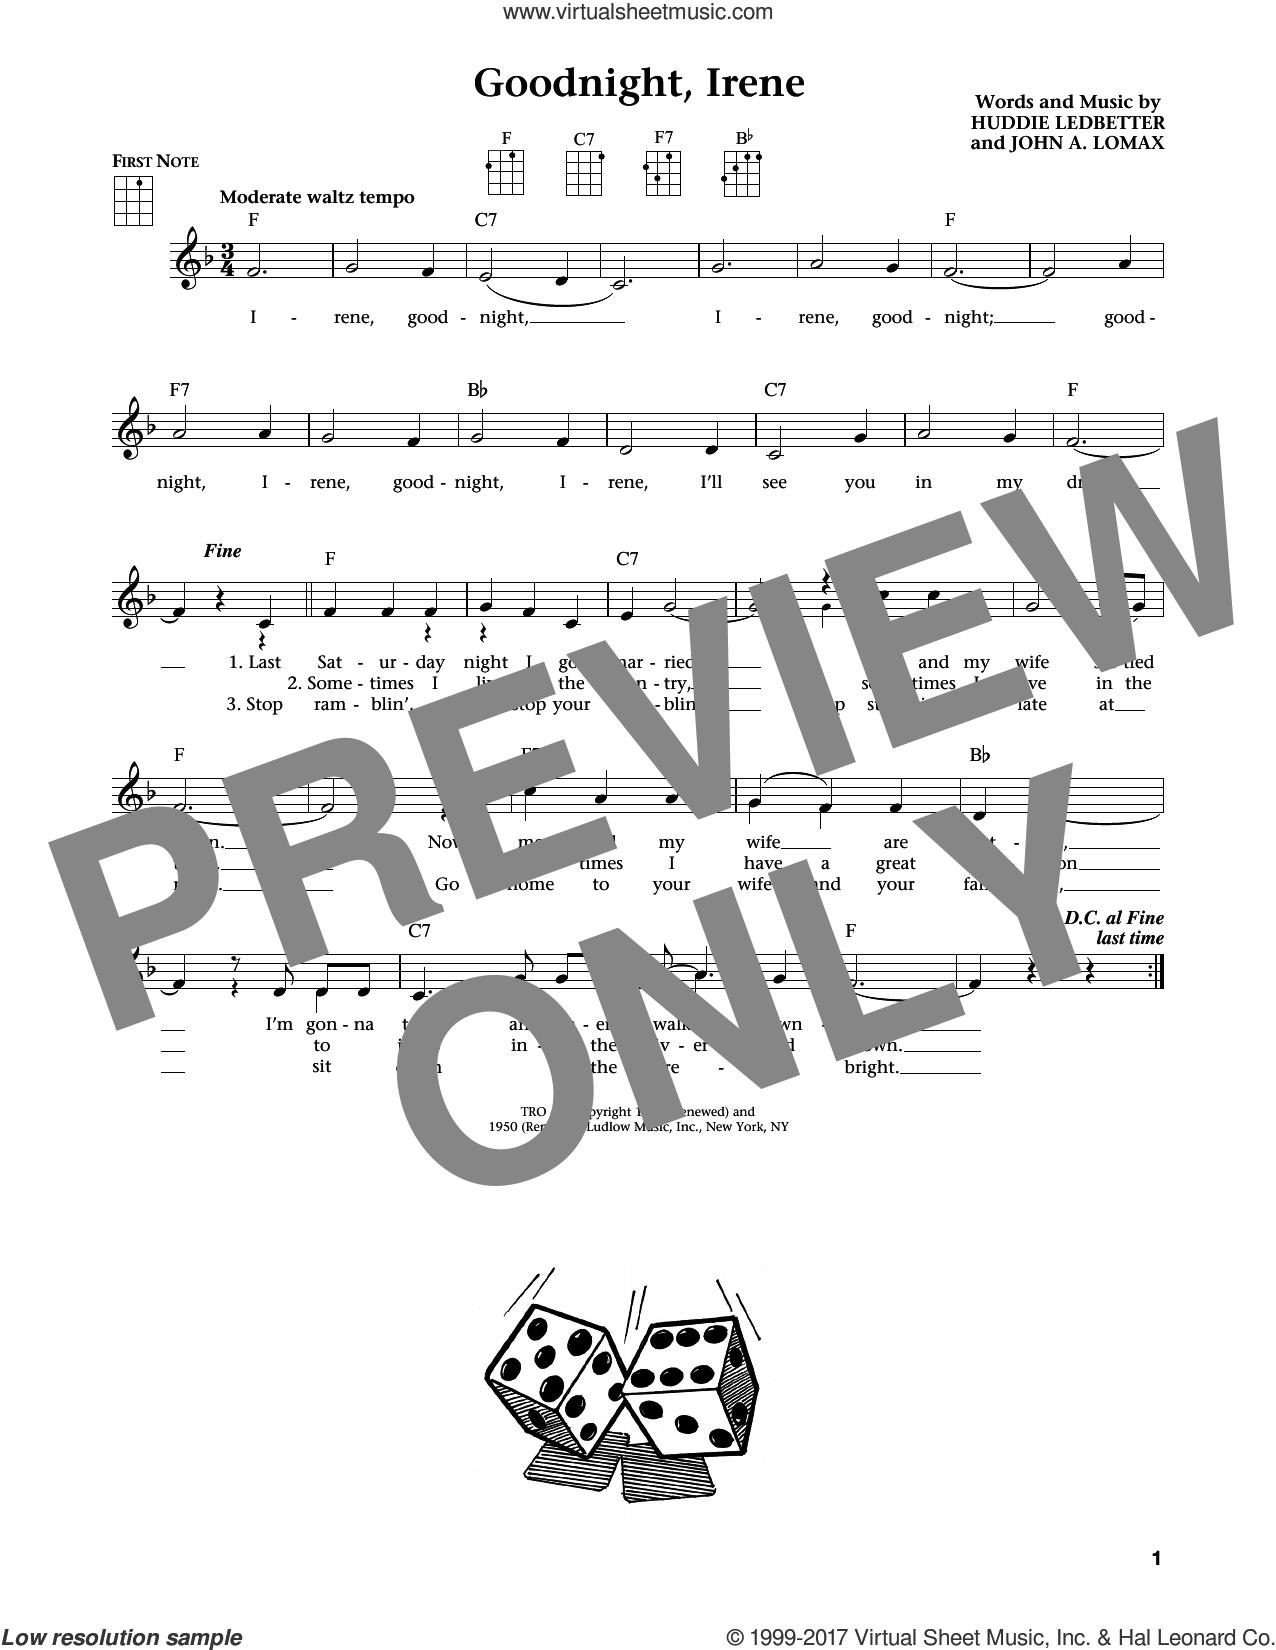 Goodnight, Irene (from The Daily Ukulele) (arr. Liz and Jim Beloff) sheet music for ukulele by Ernest Tubb & Red Foley, Jim Beloff, Johnny Cash, Liz Beloff, Peter, Paul & Mary, Huddie Ledbetter and John A. Lomax, intermediate skill level